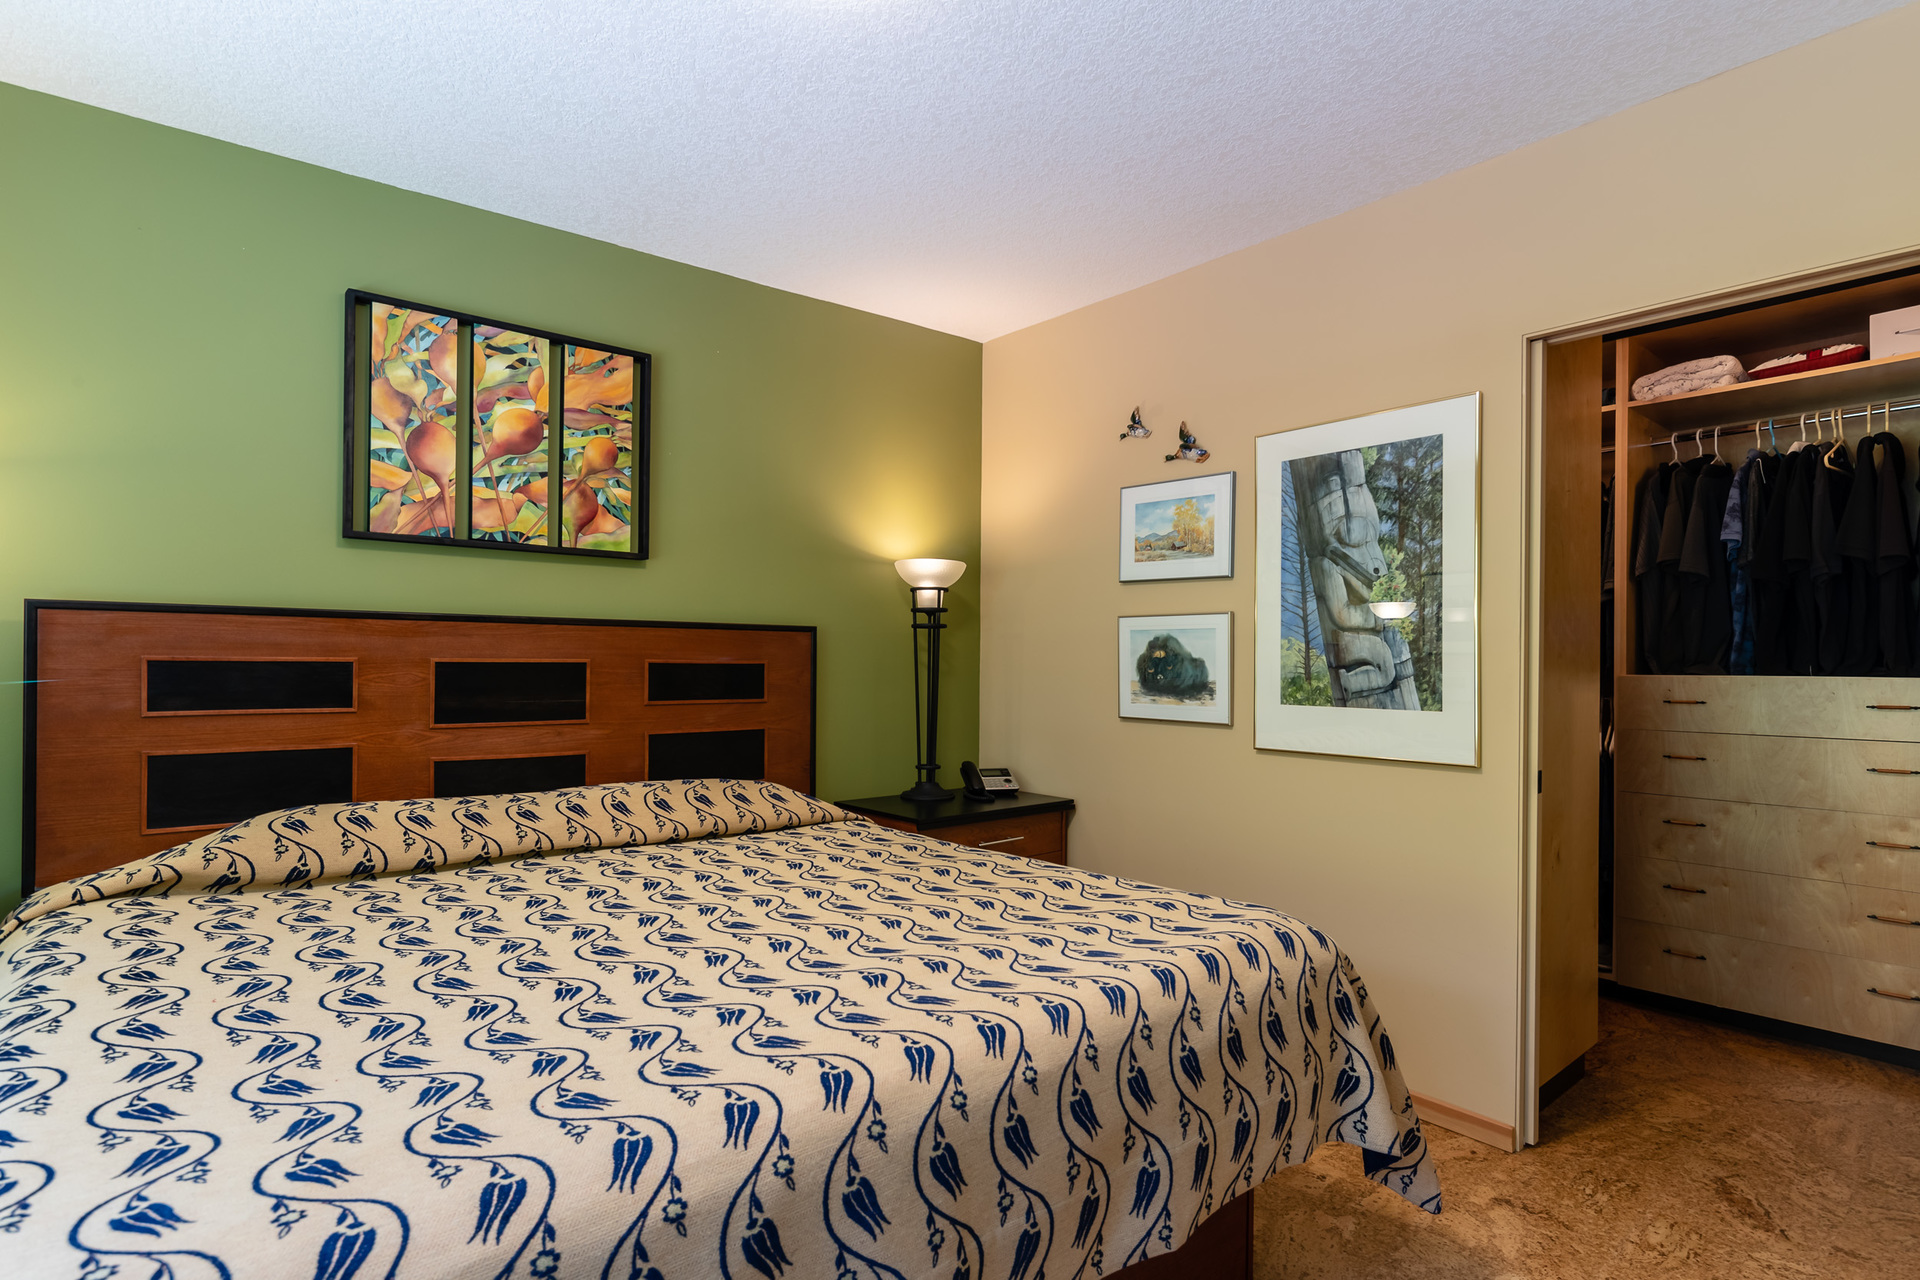 First Master Suite Bedroom With Walk-In Closet at 5101 Island Highway West, Qualicum Beach, Zone 05 - Parksville/Qualicum